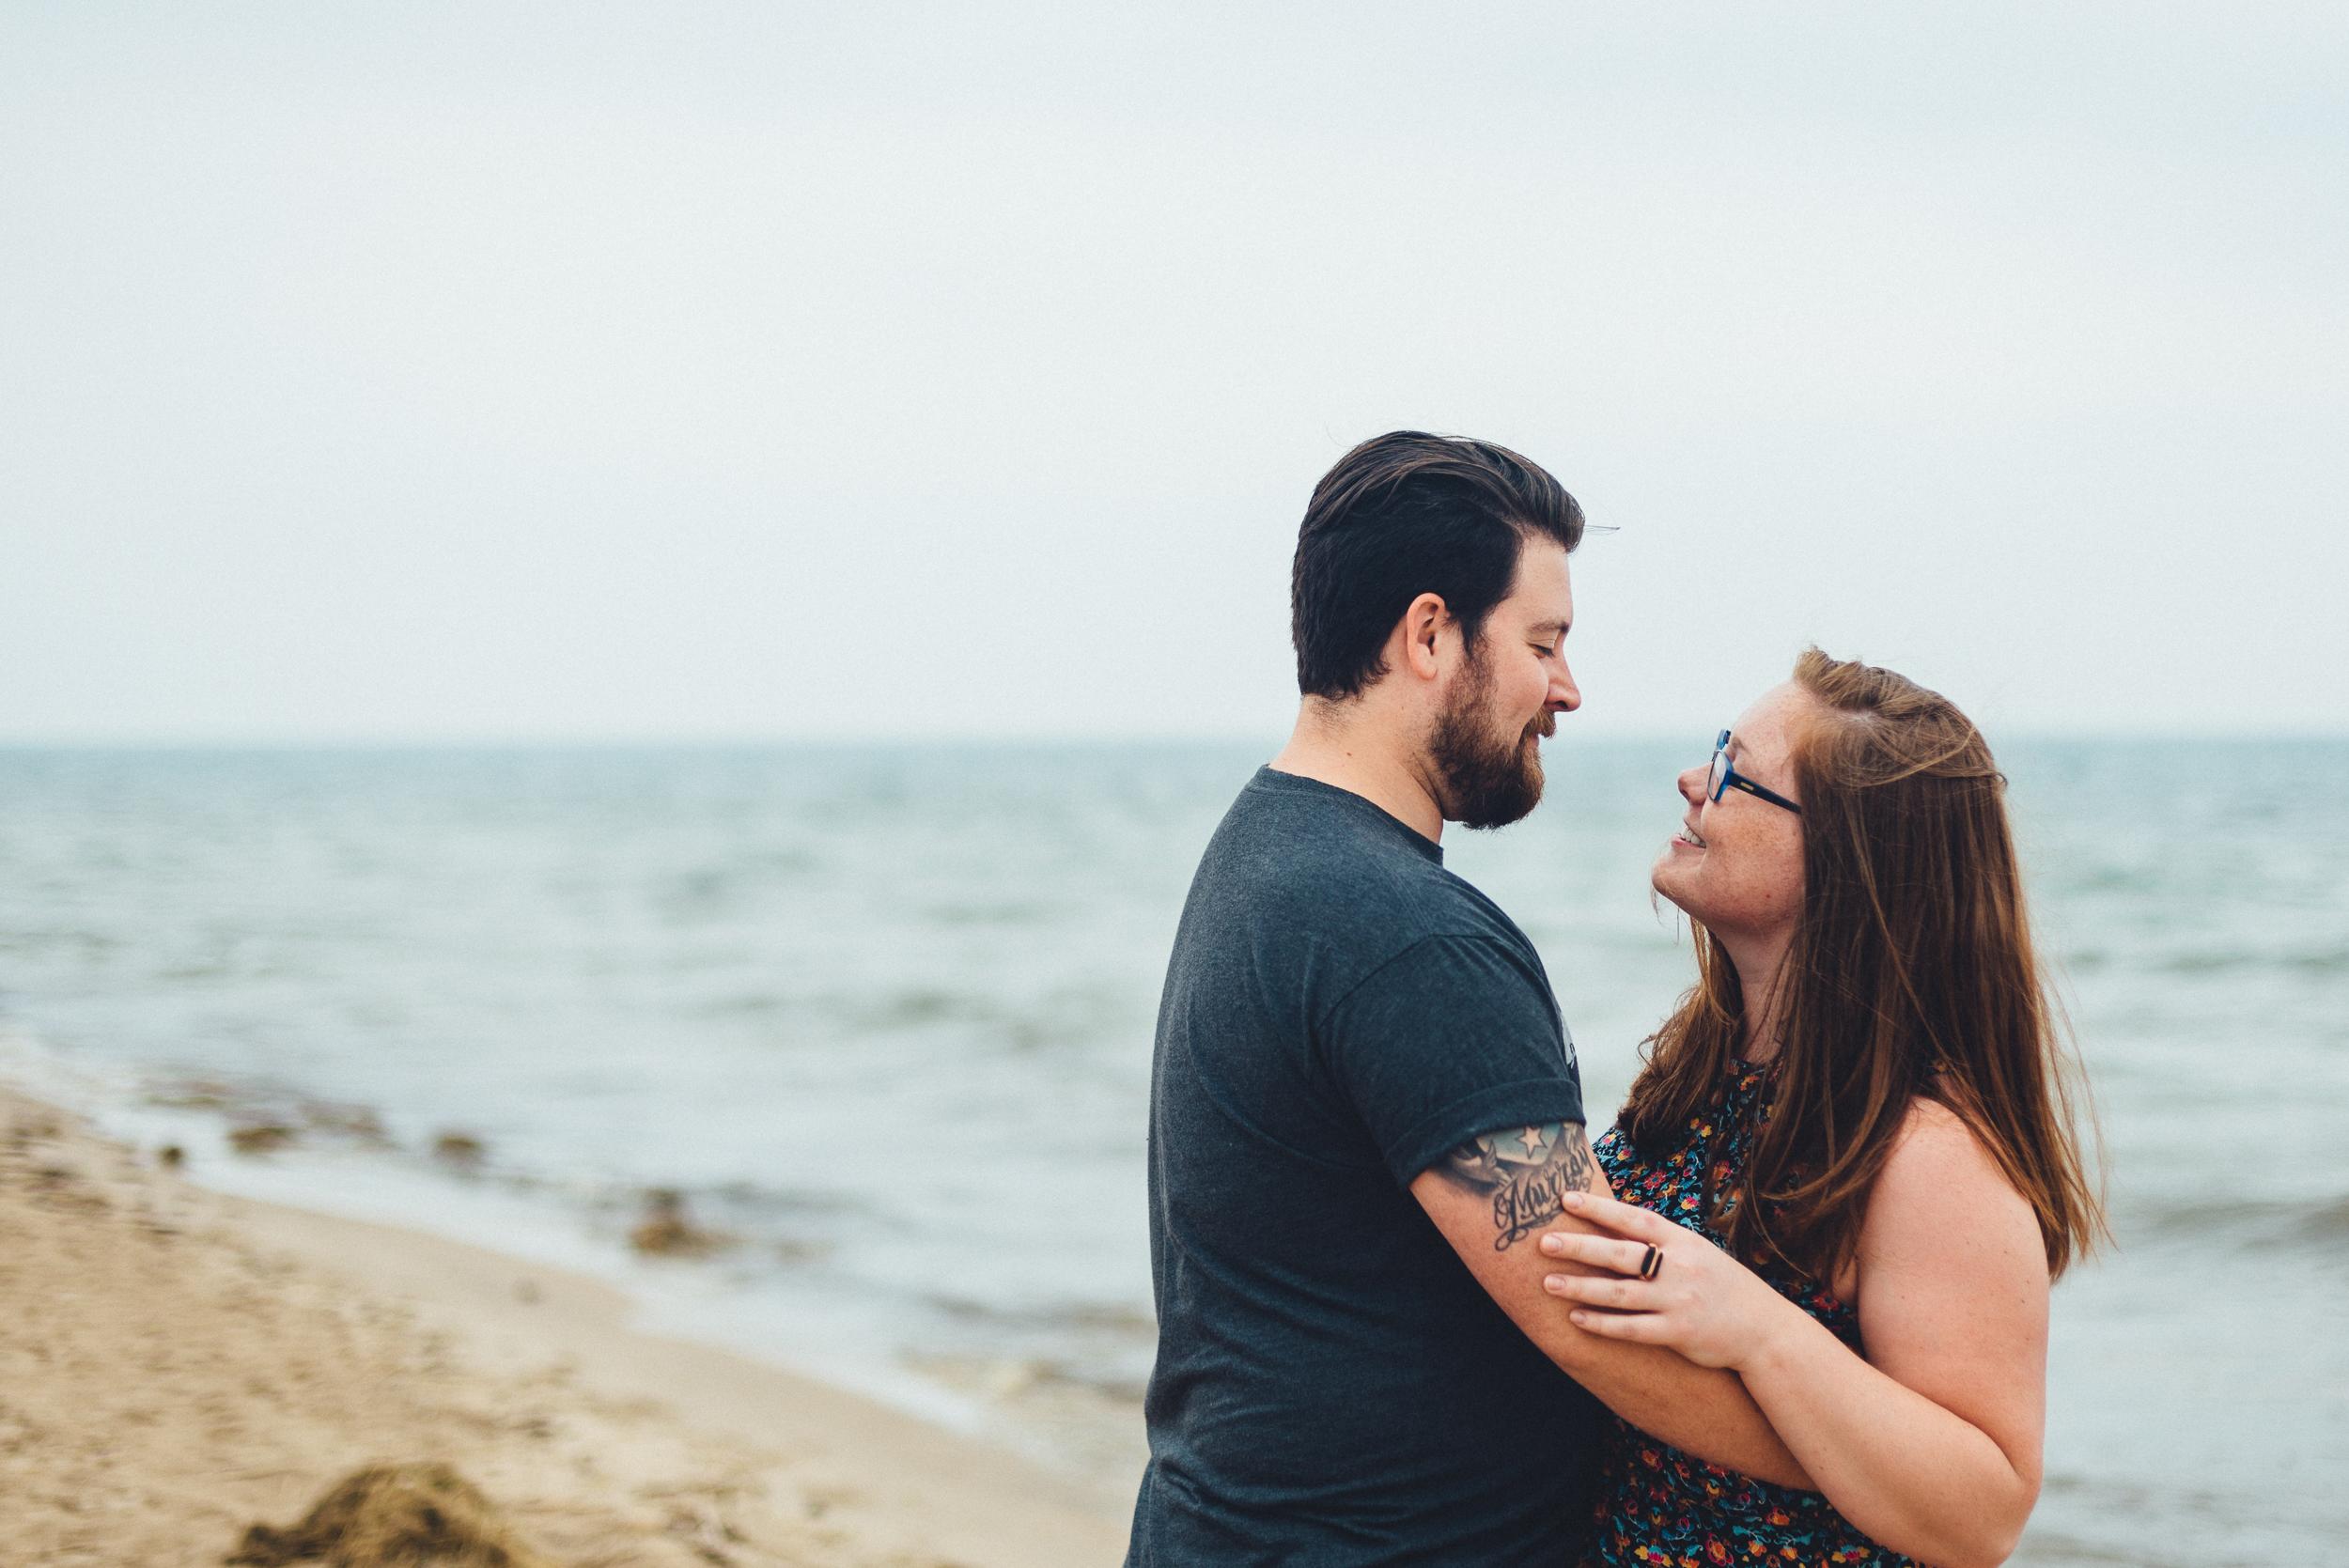 beach_couple_photography_engagment_love_long_island_photographer-03.jpg